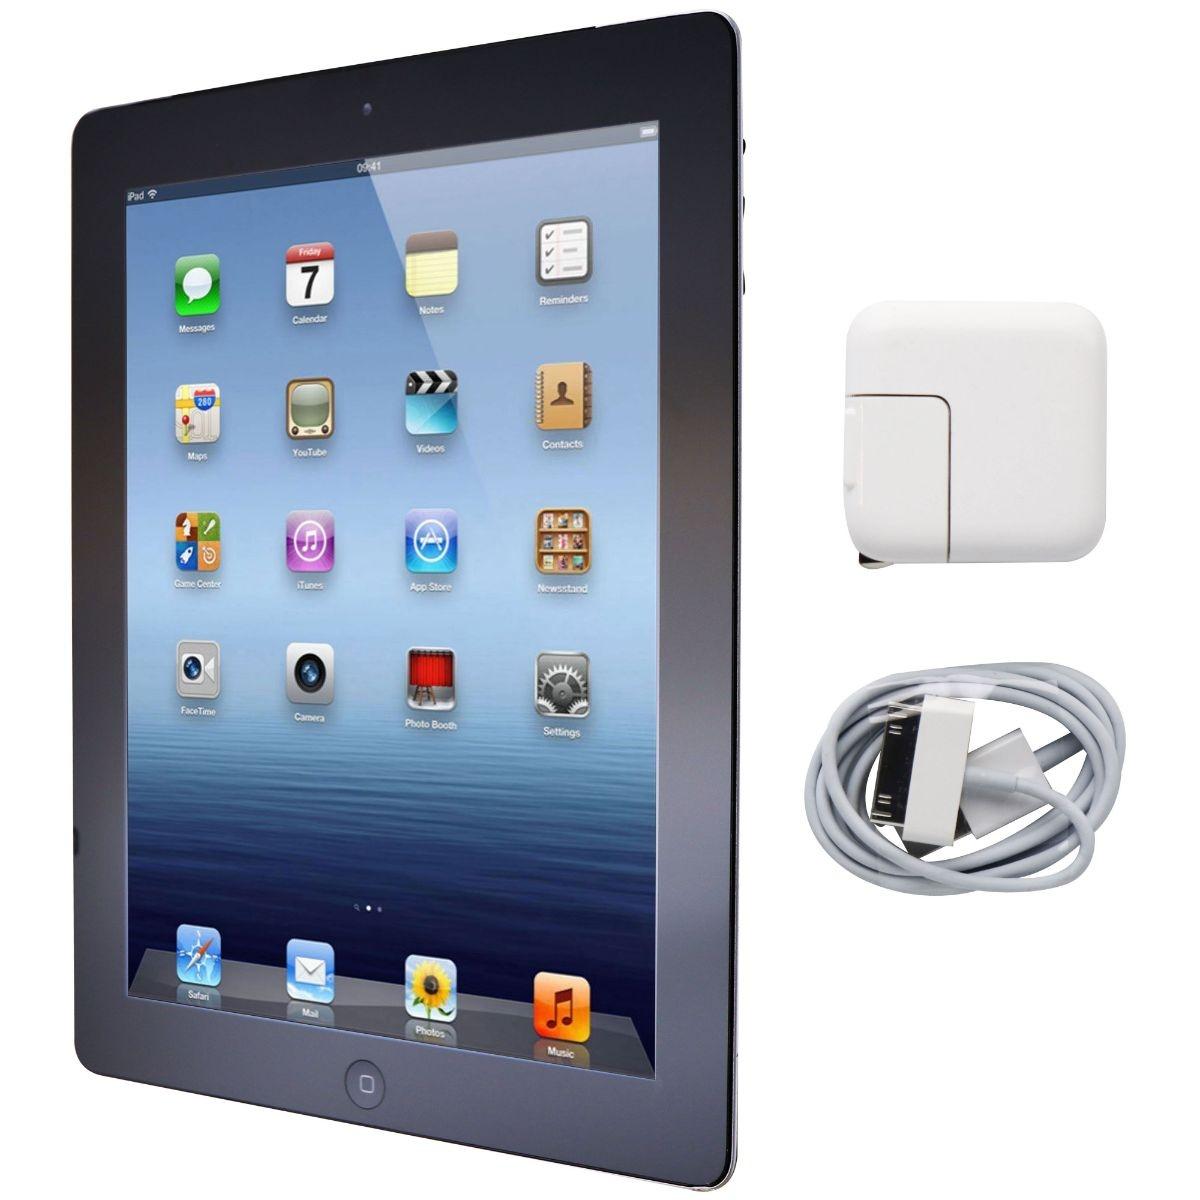 Apple iPad 9.7-inch (3rd Generation) Tablet A1430 (AT&T Locked) - 32GB / Black